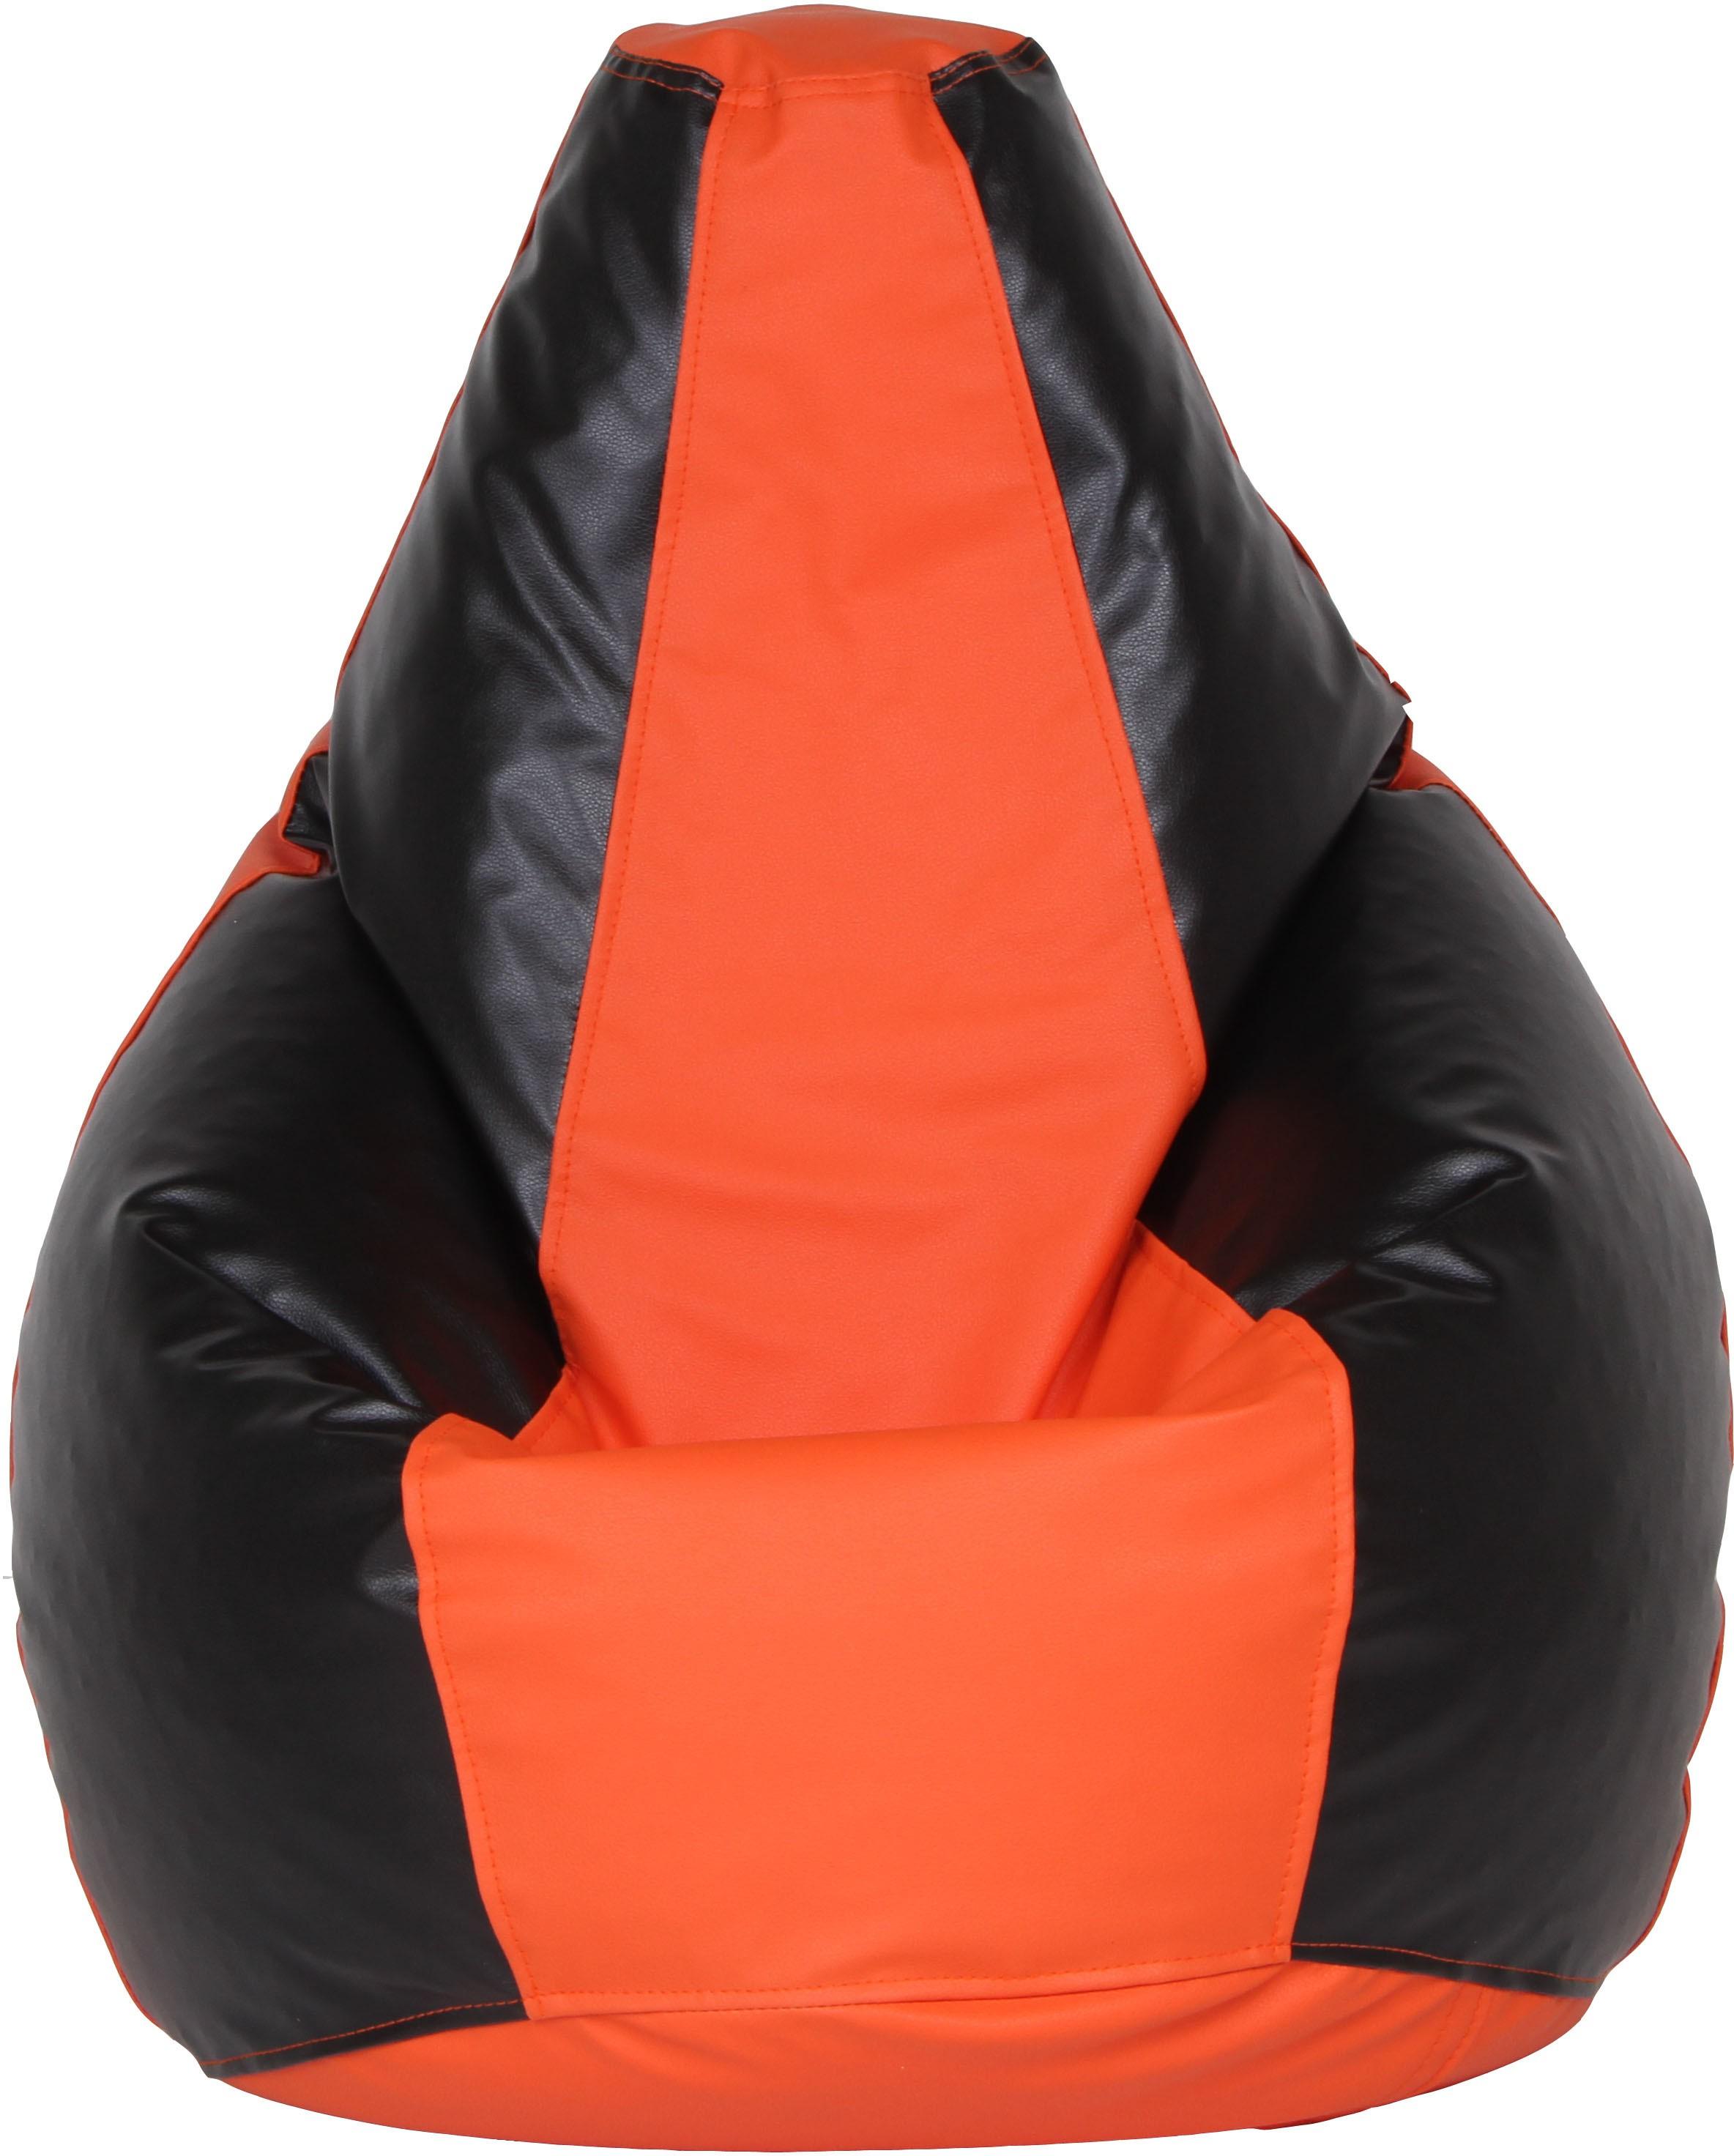 View Mobler XXL Bean Bag  With Foam Filling(Multicolor) Furniture (Mobler)